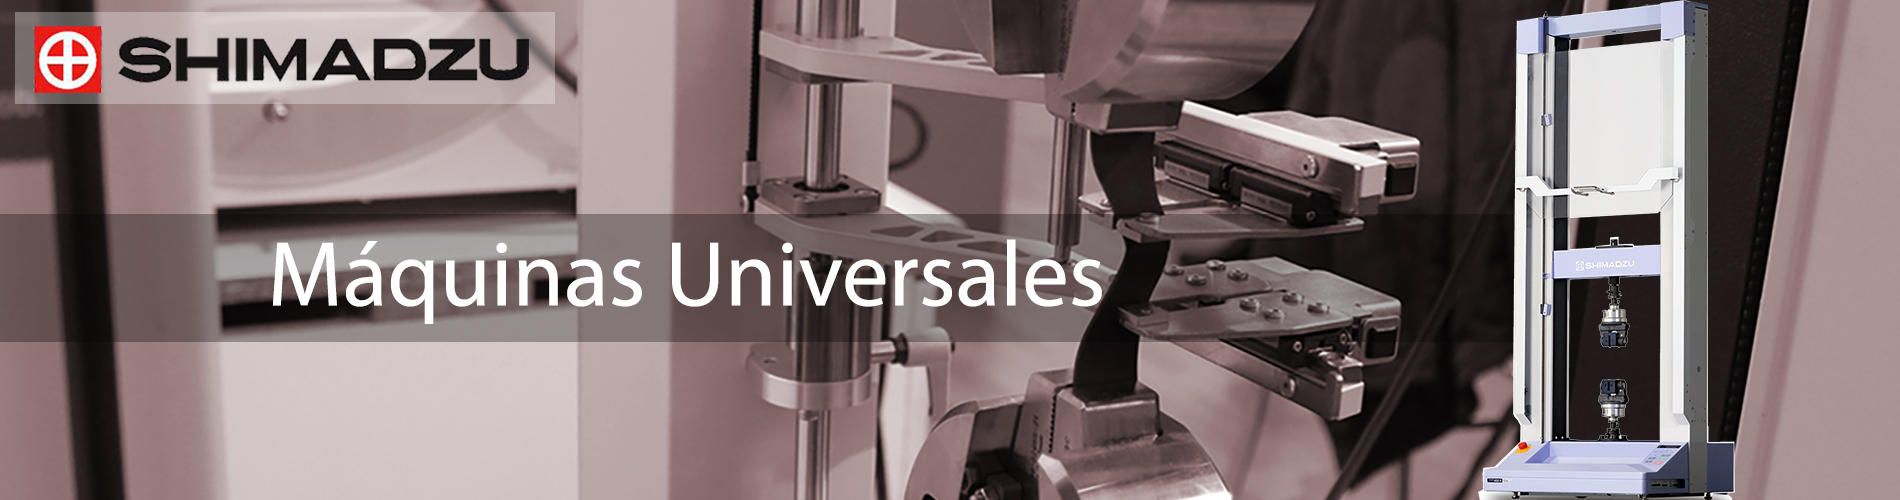 Máquinas Universales